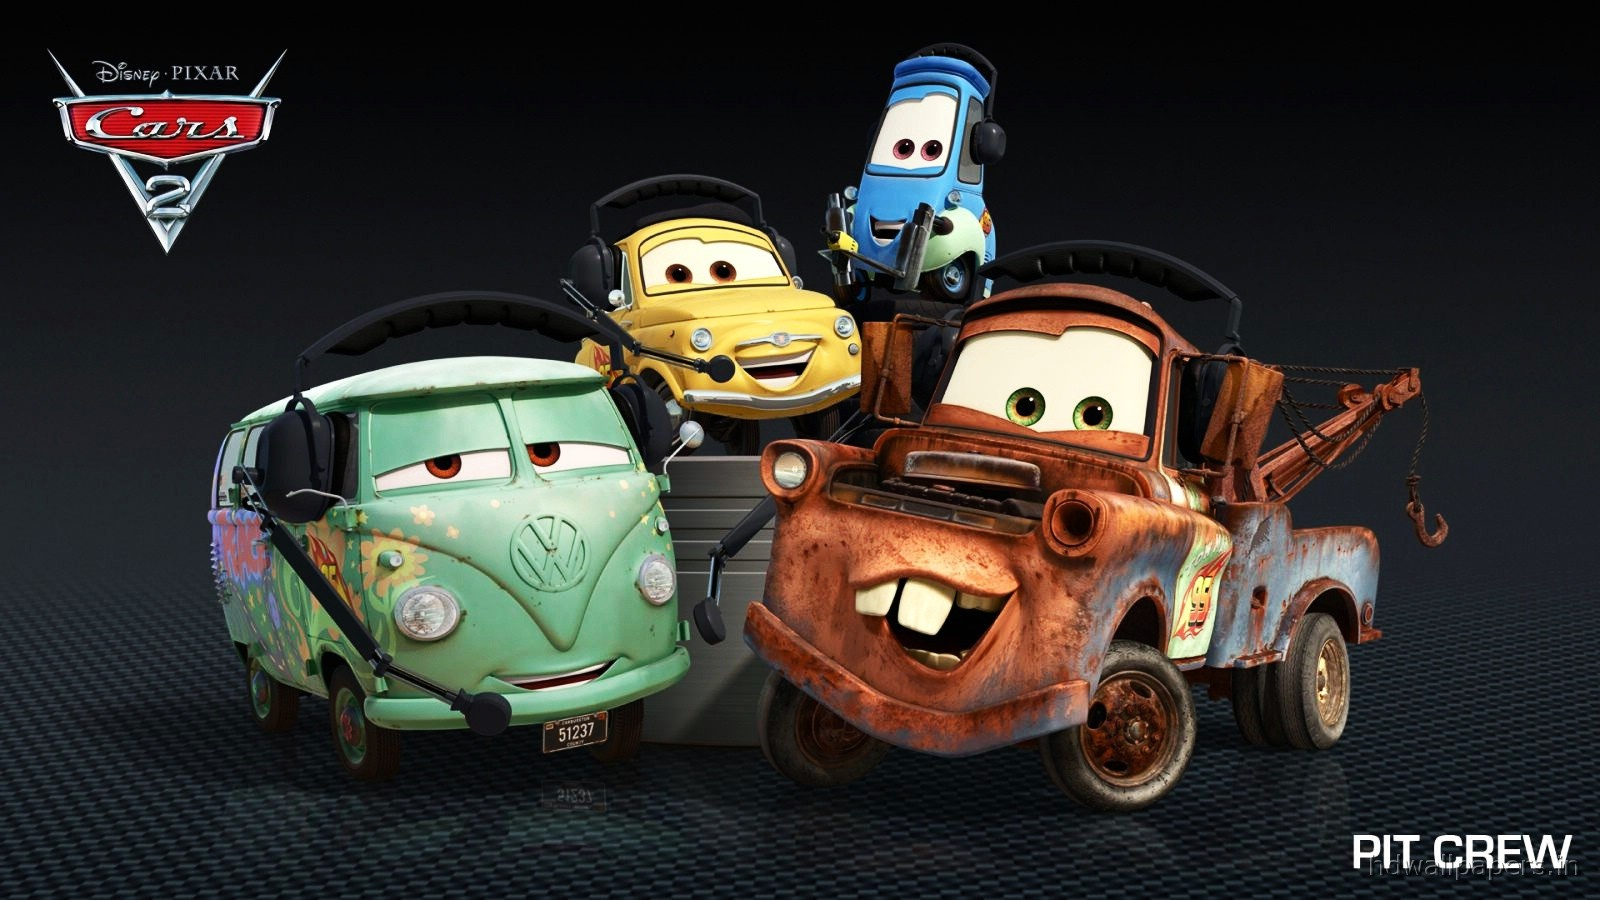 Pixars Cars 2 HD Wallpapers Best High Quality Car Desktop Wallpapers 1600x900